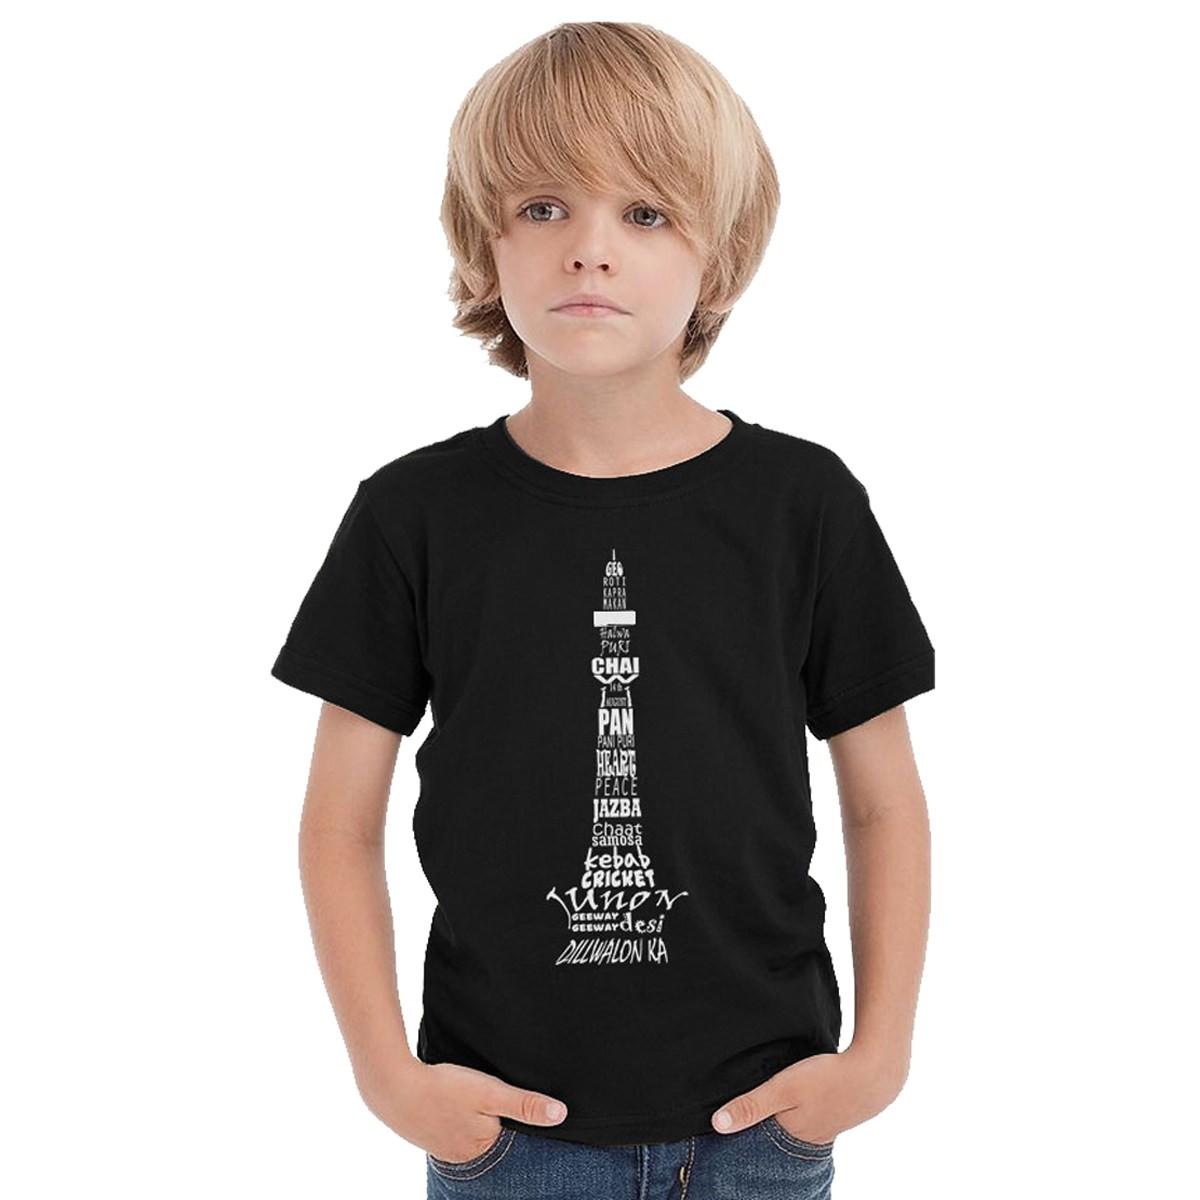 7b7ae5ee Kid T-Shirt M3 - Great Lakes Custom Embroidery